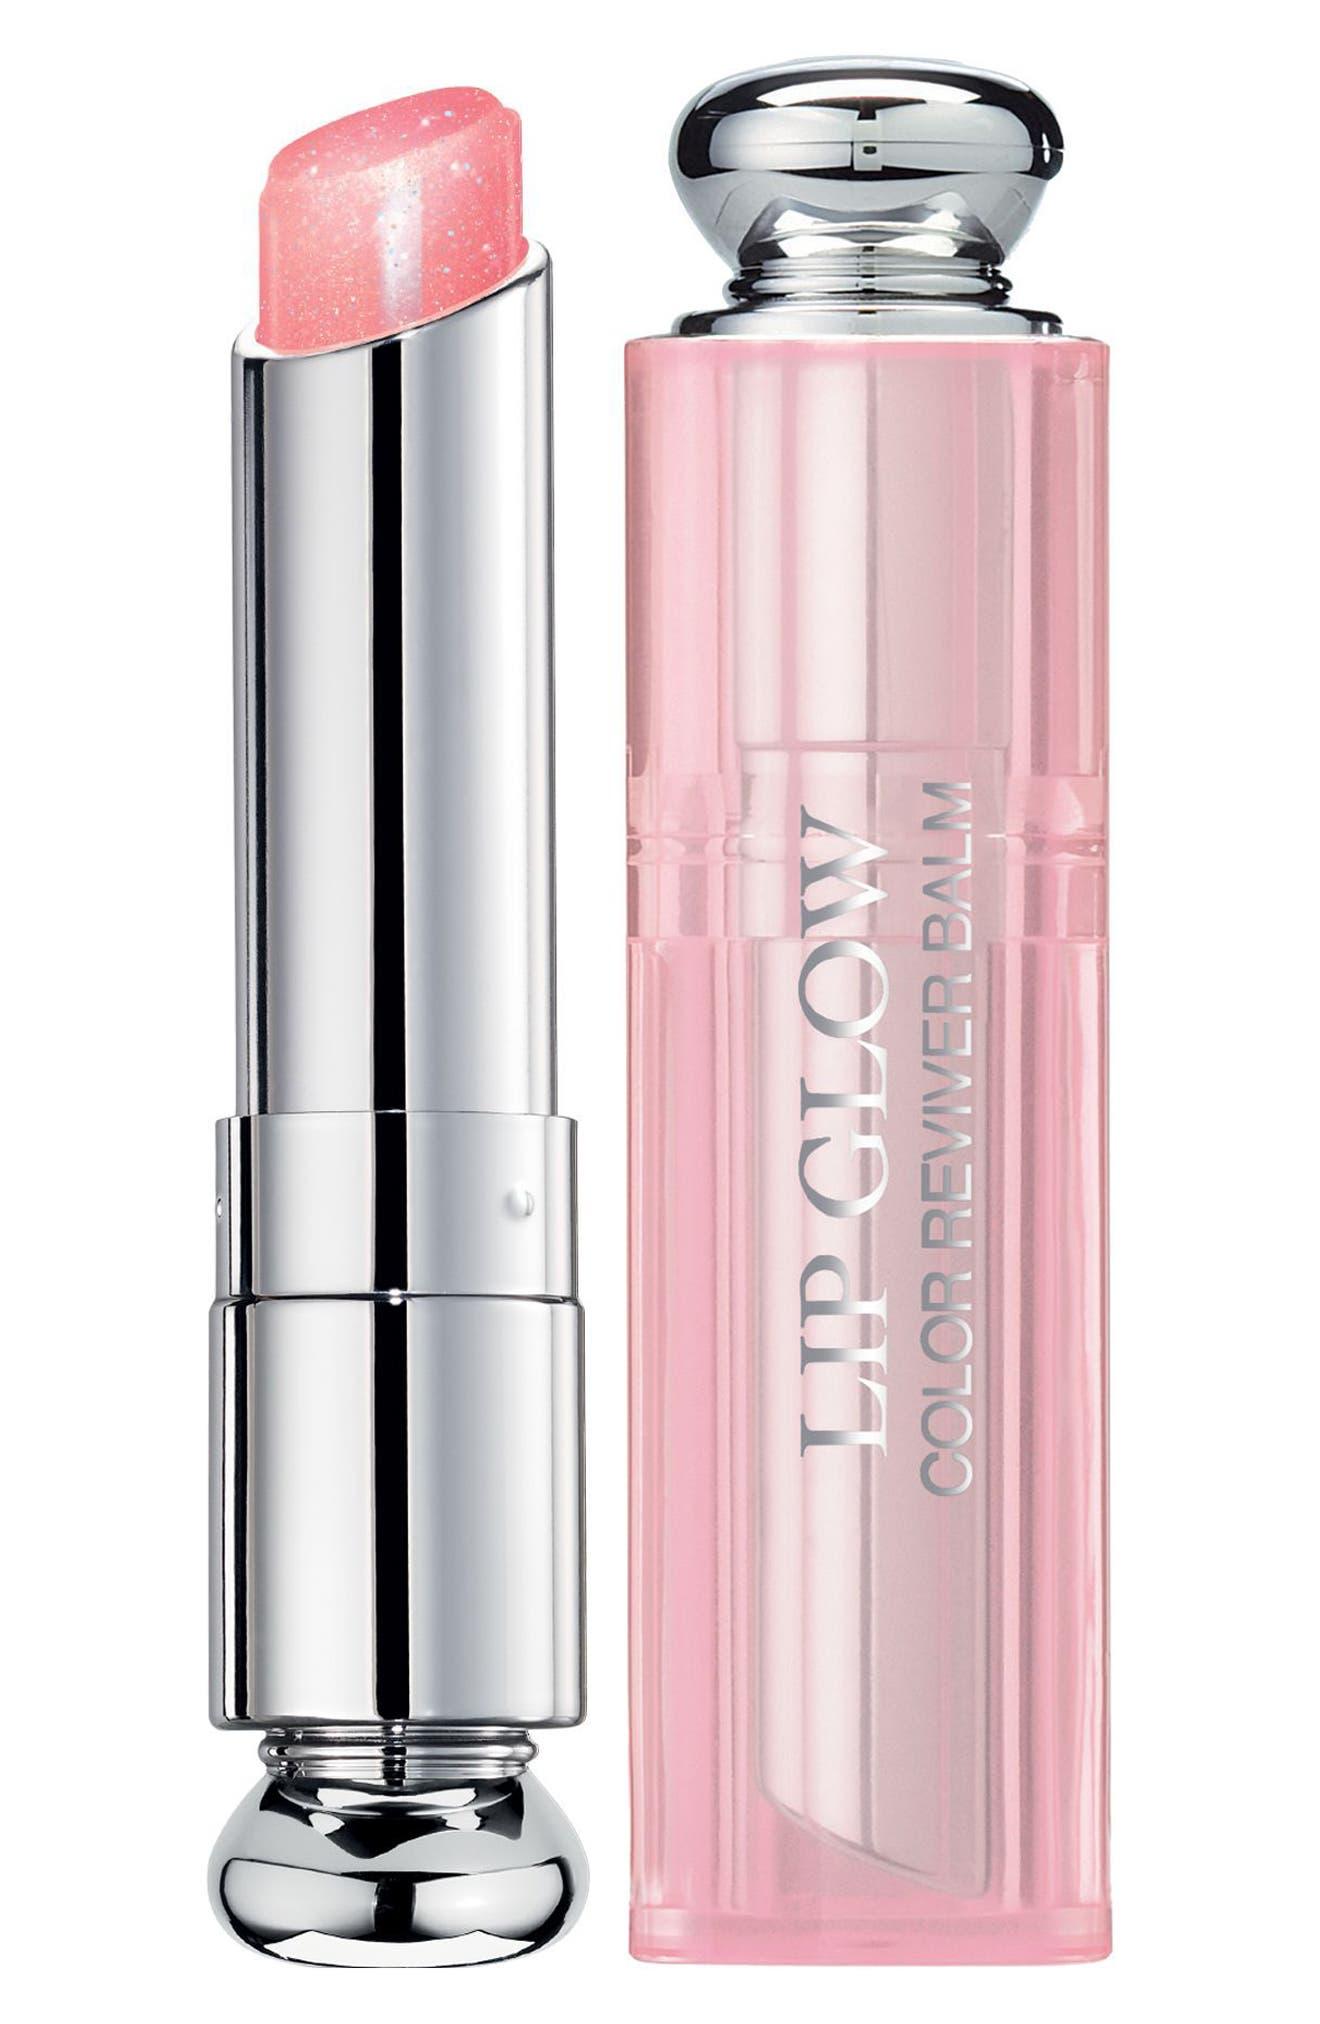 Dior Addict Lip Glow Color Reviving Lip Balm - 010 Pink / Holographic